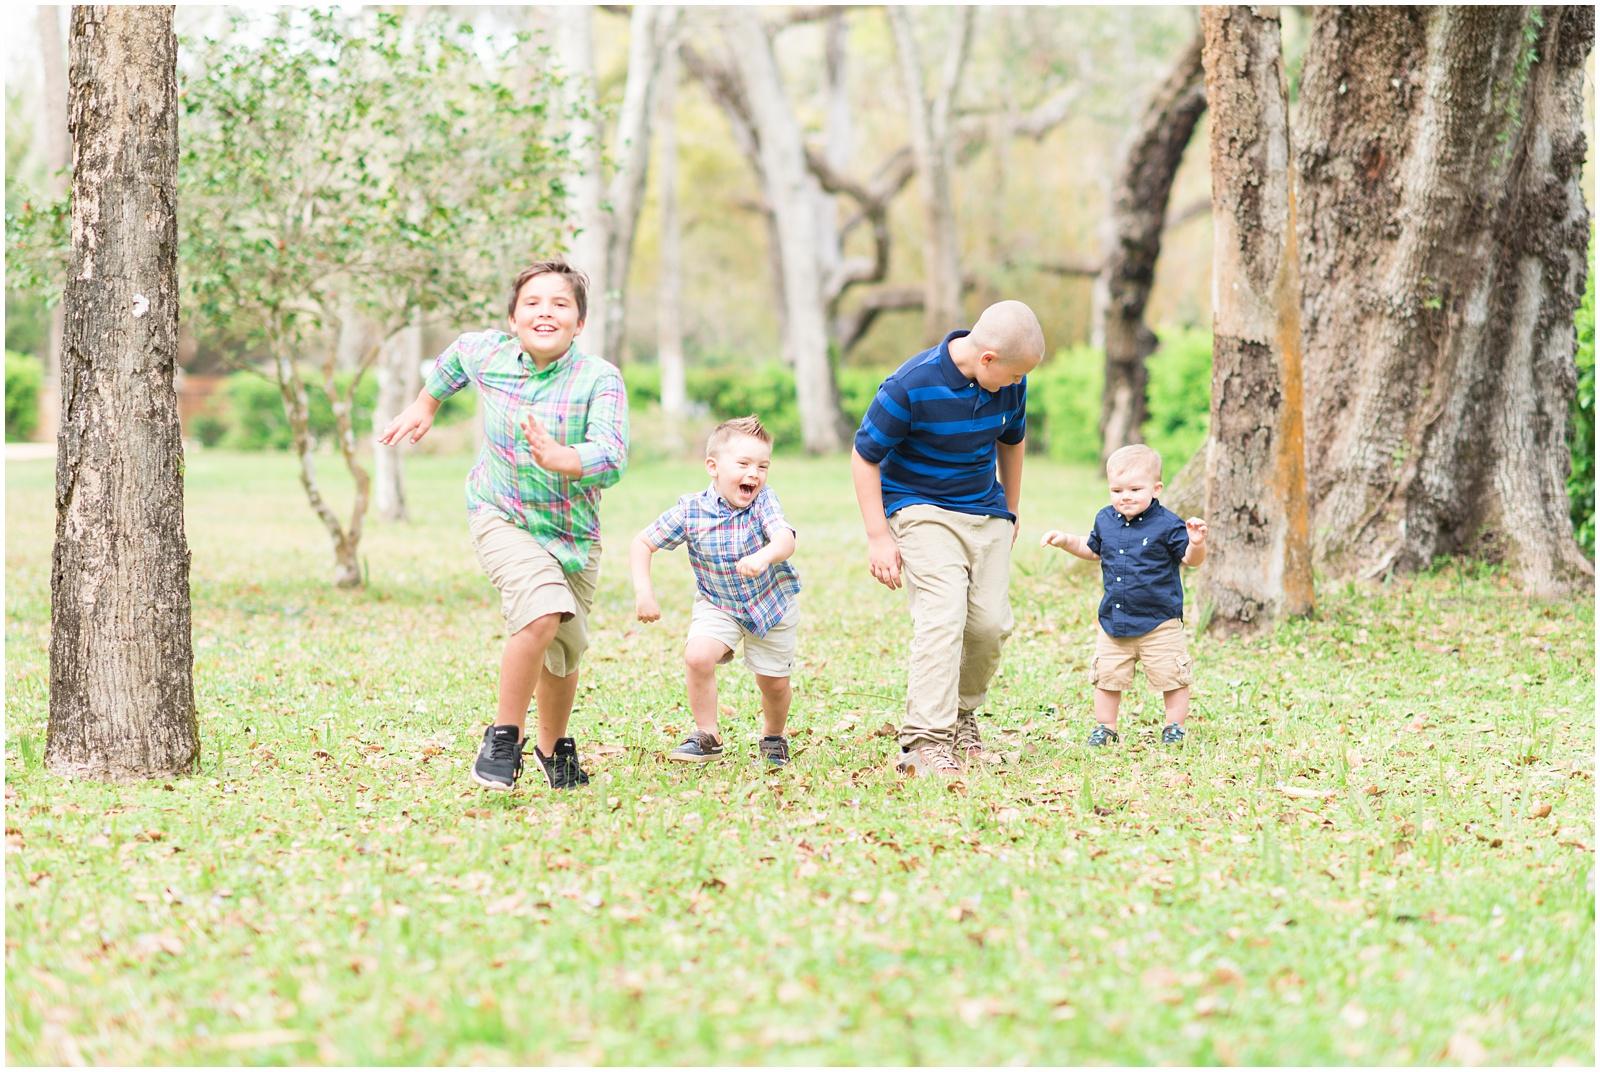 Washington Oaks_Garden_State Park_Family_Portraits_6.jpg